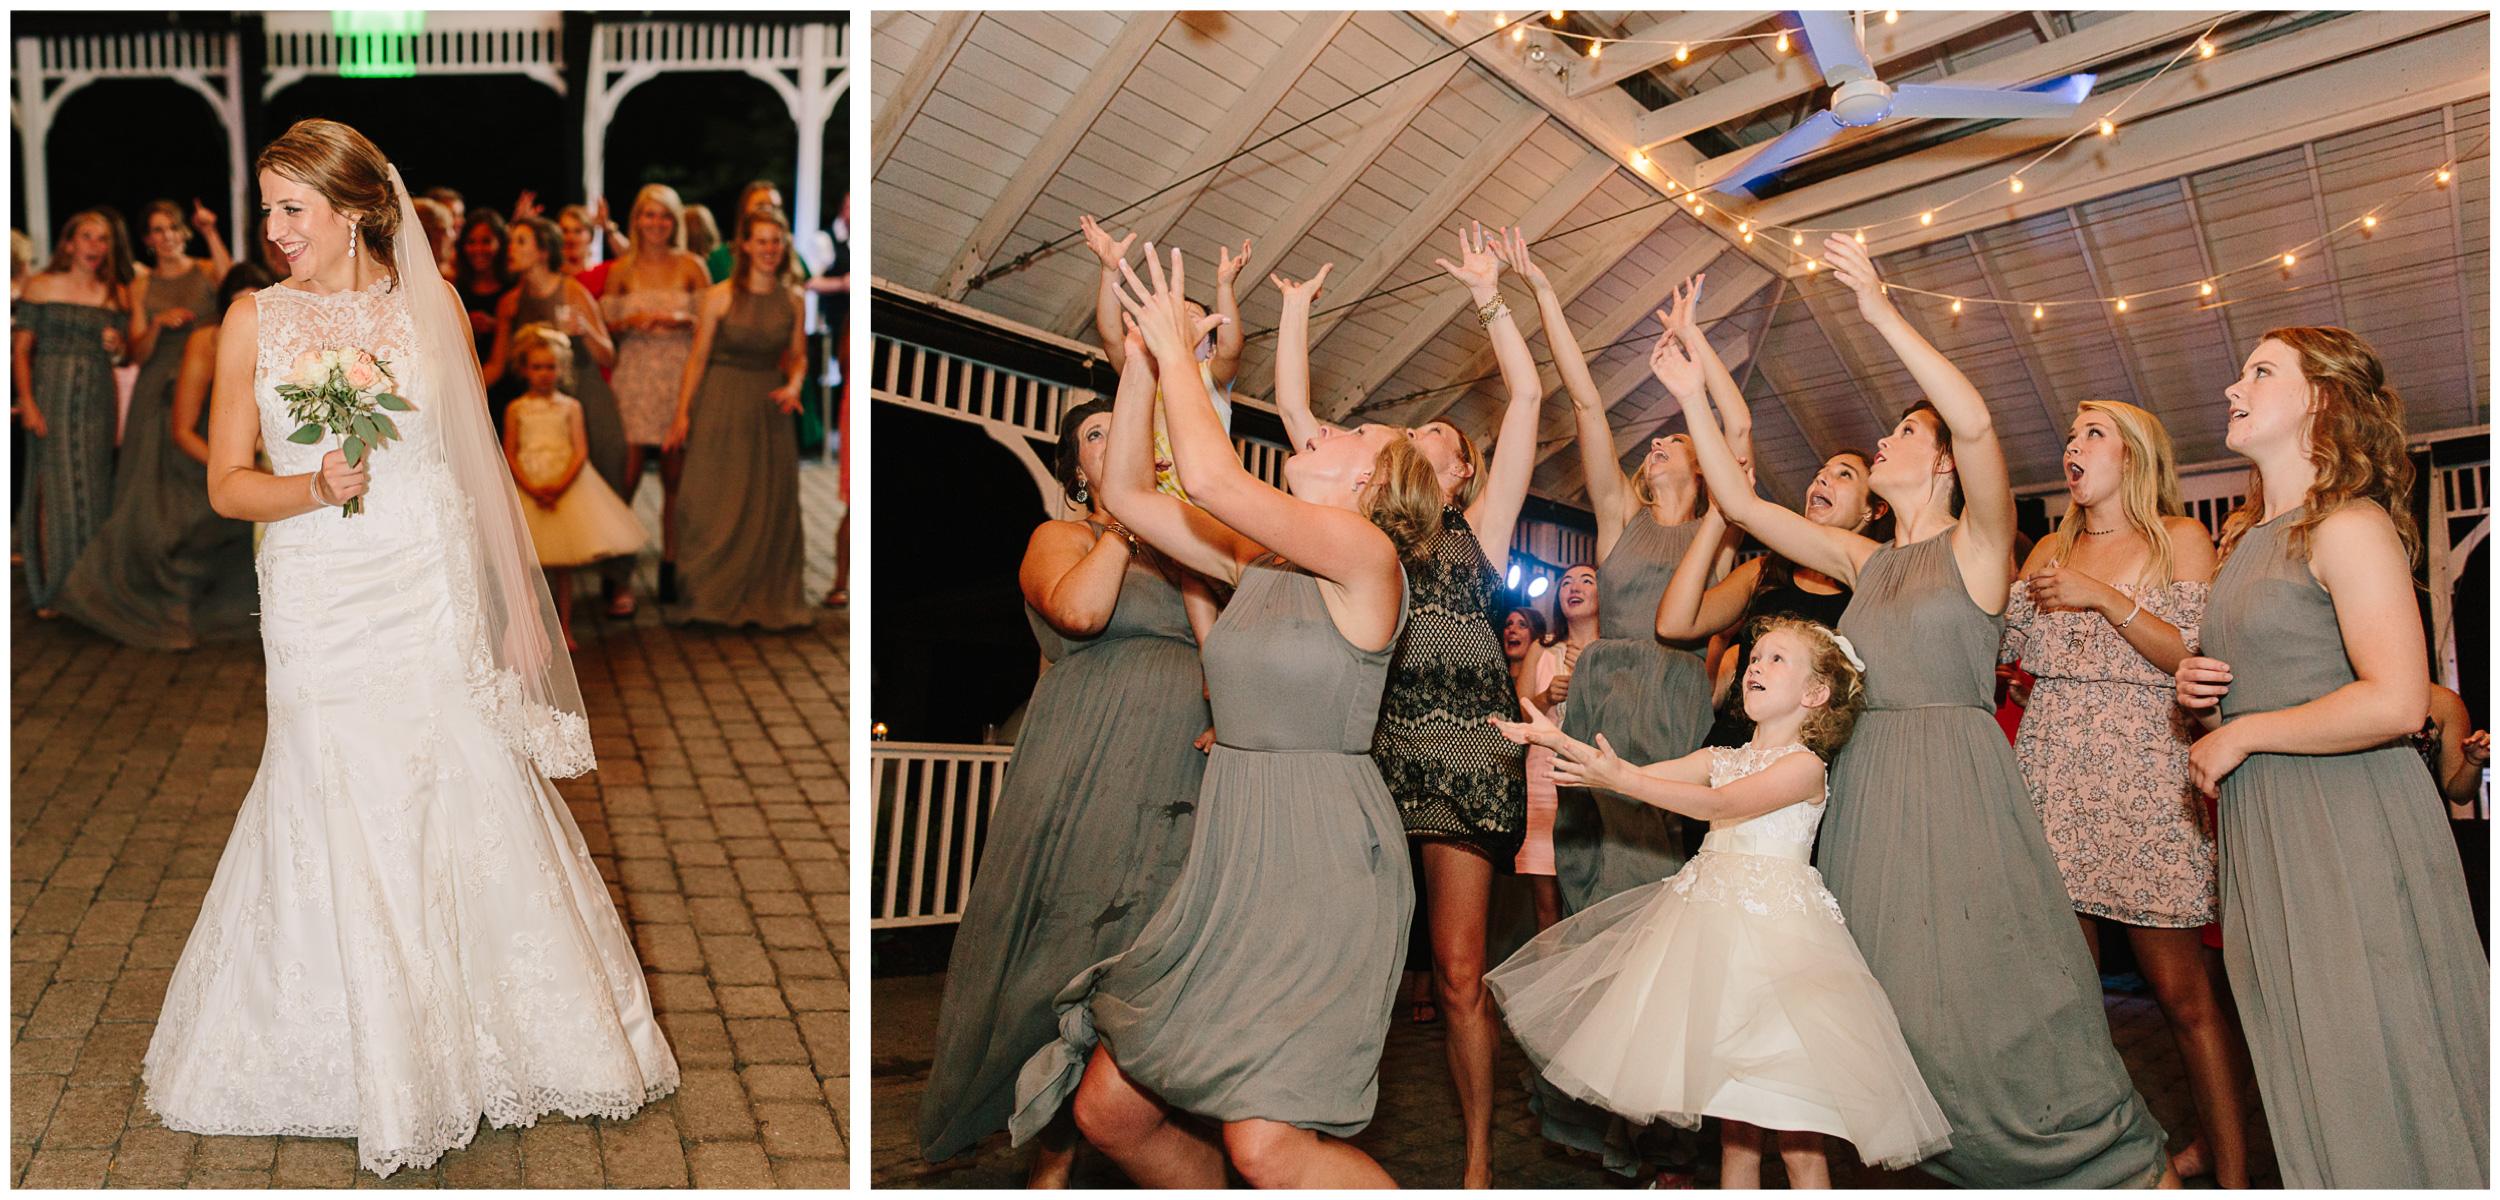 ann_arbor_michigan_wedding_107.jpg